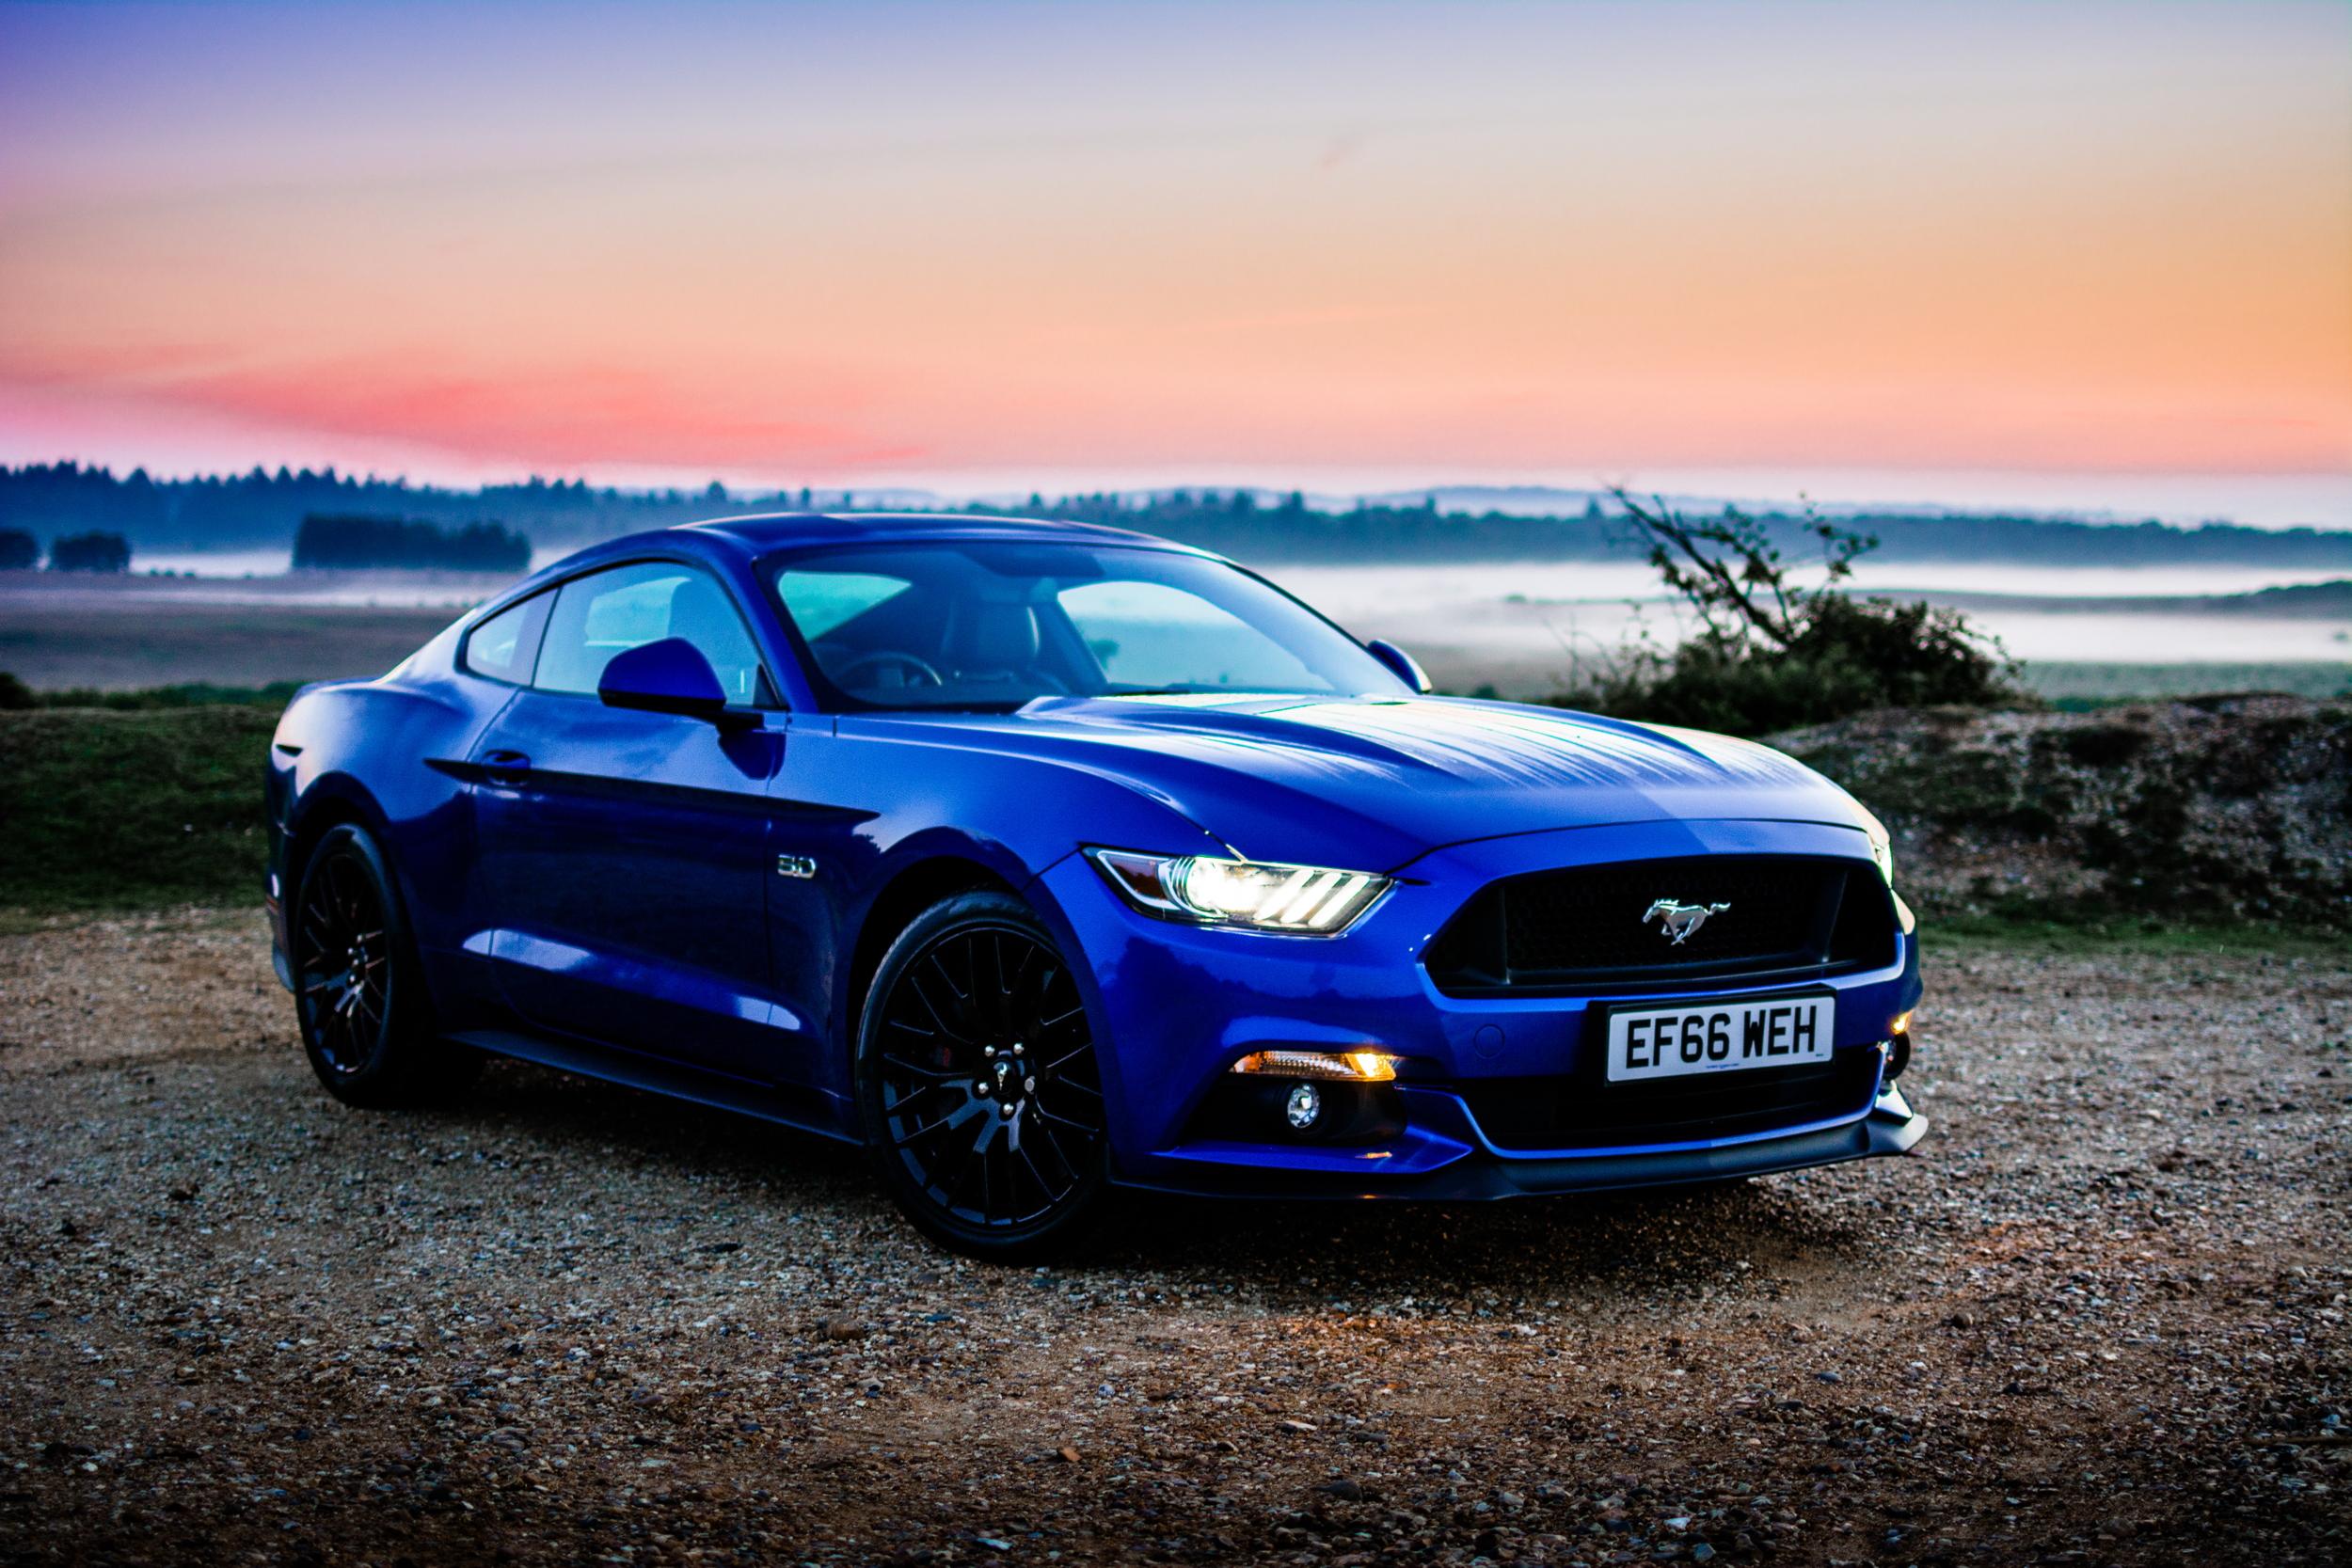 Ford Mustang sunrise